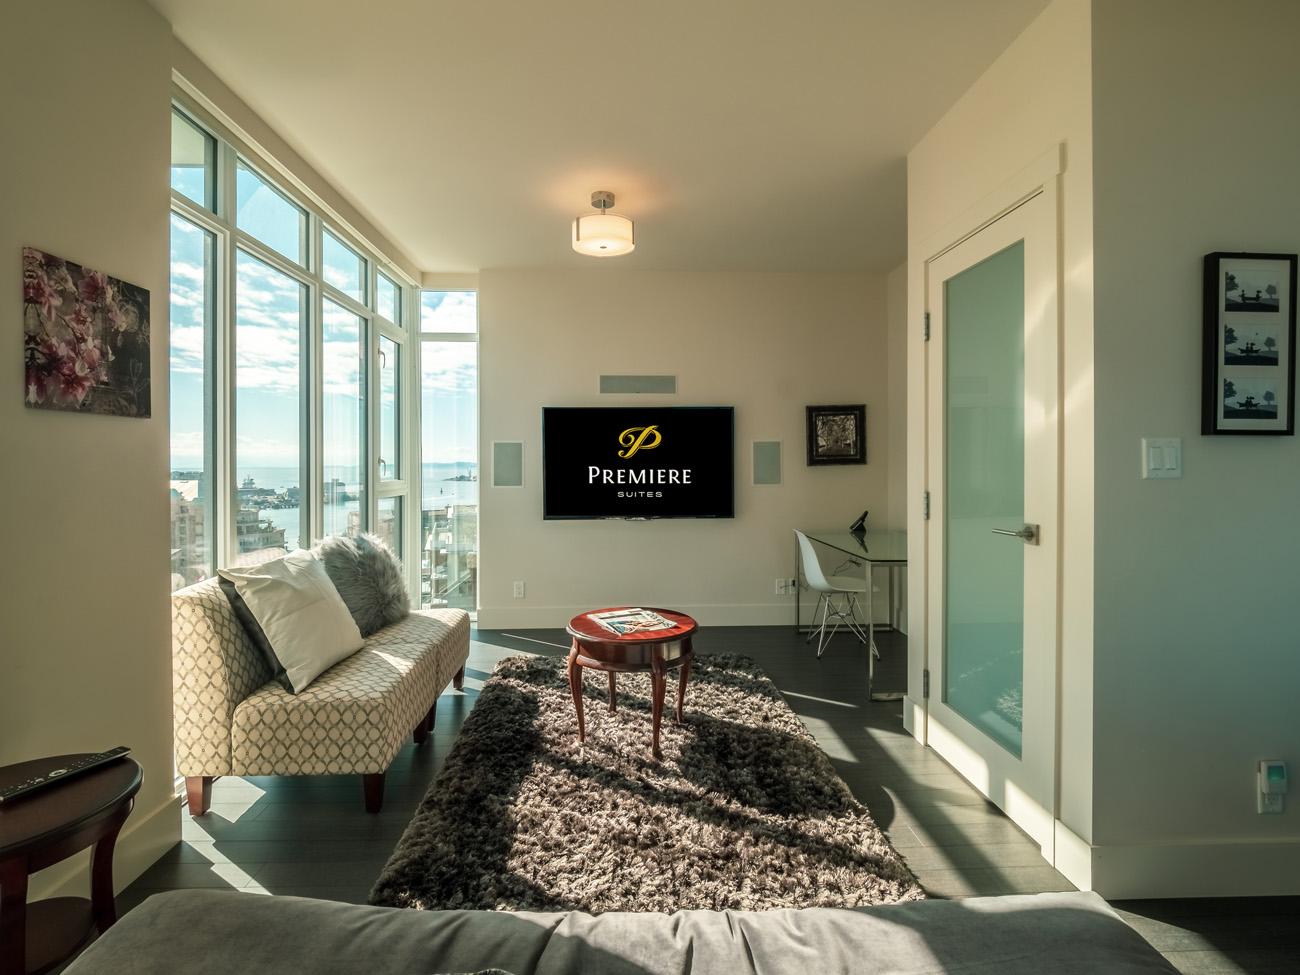 Premiere Suites Victoria rental condo flatscreen TV, furnished living room, views